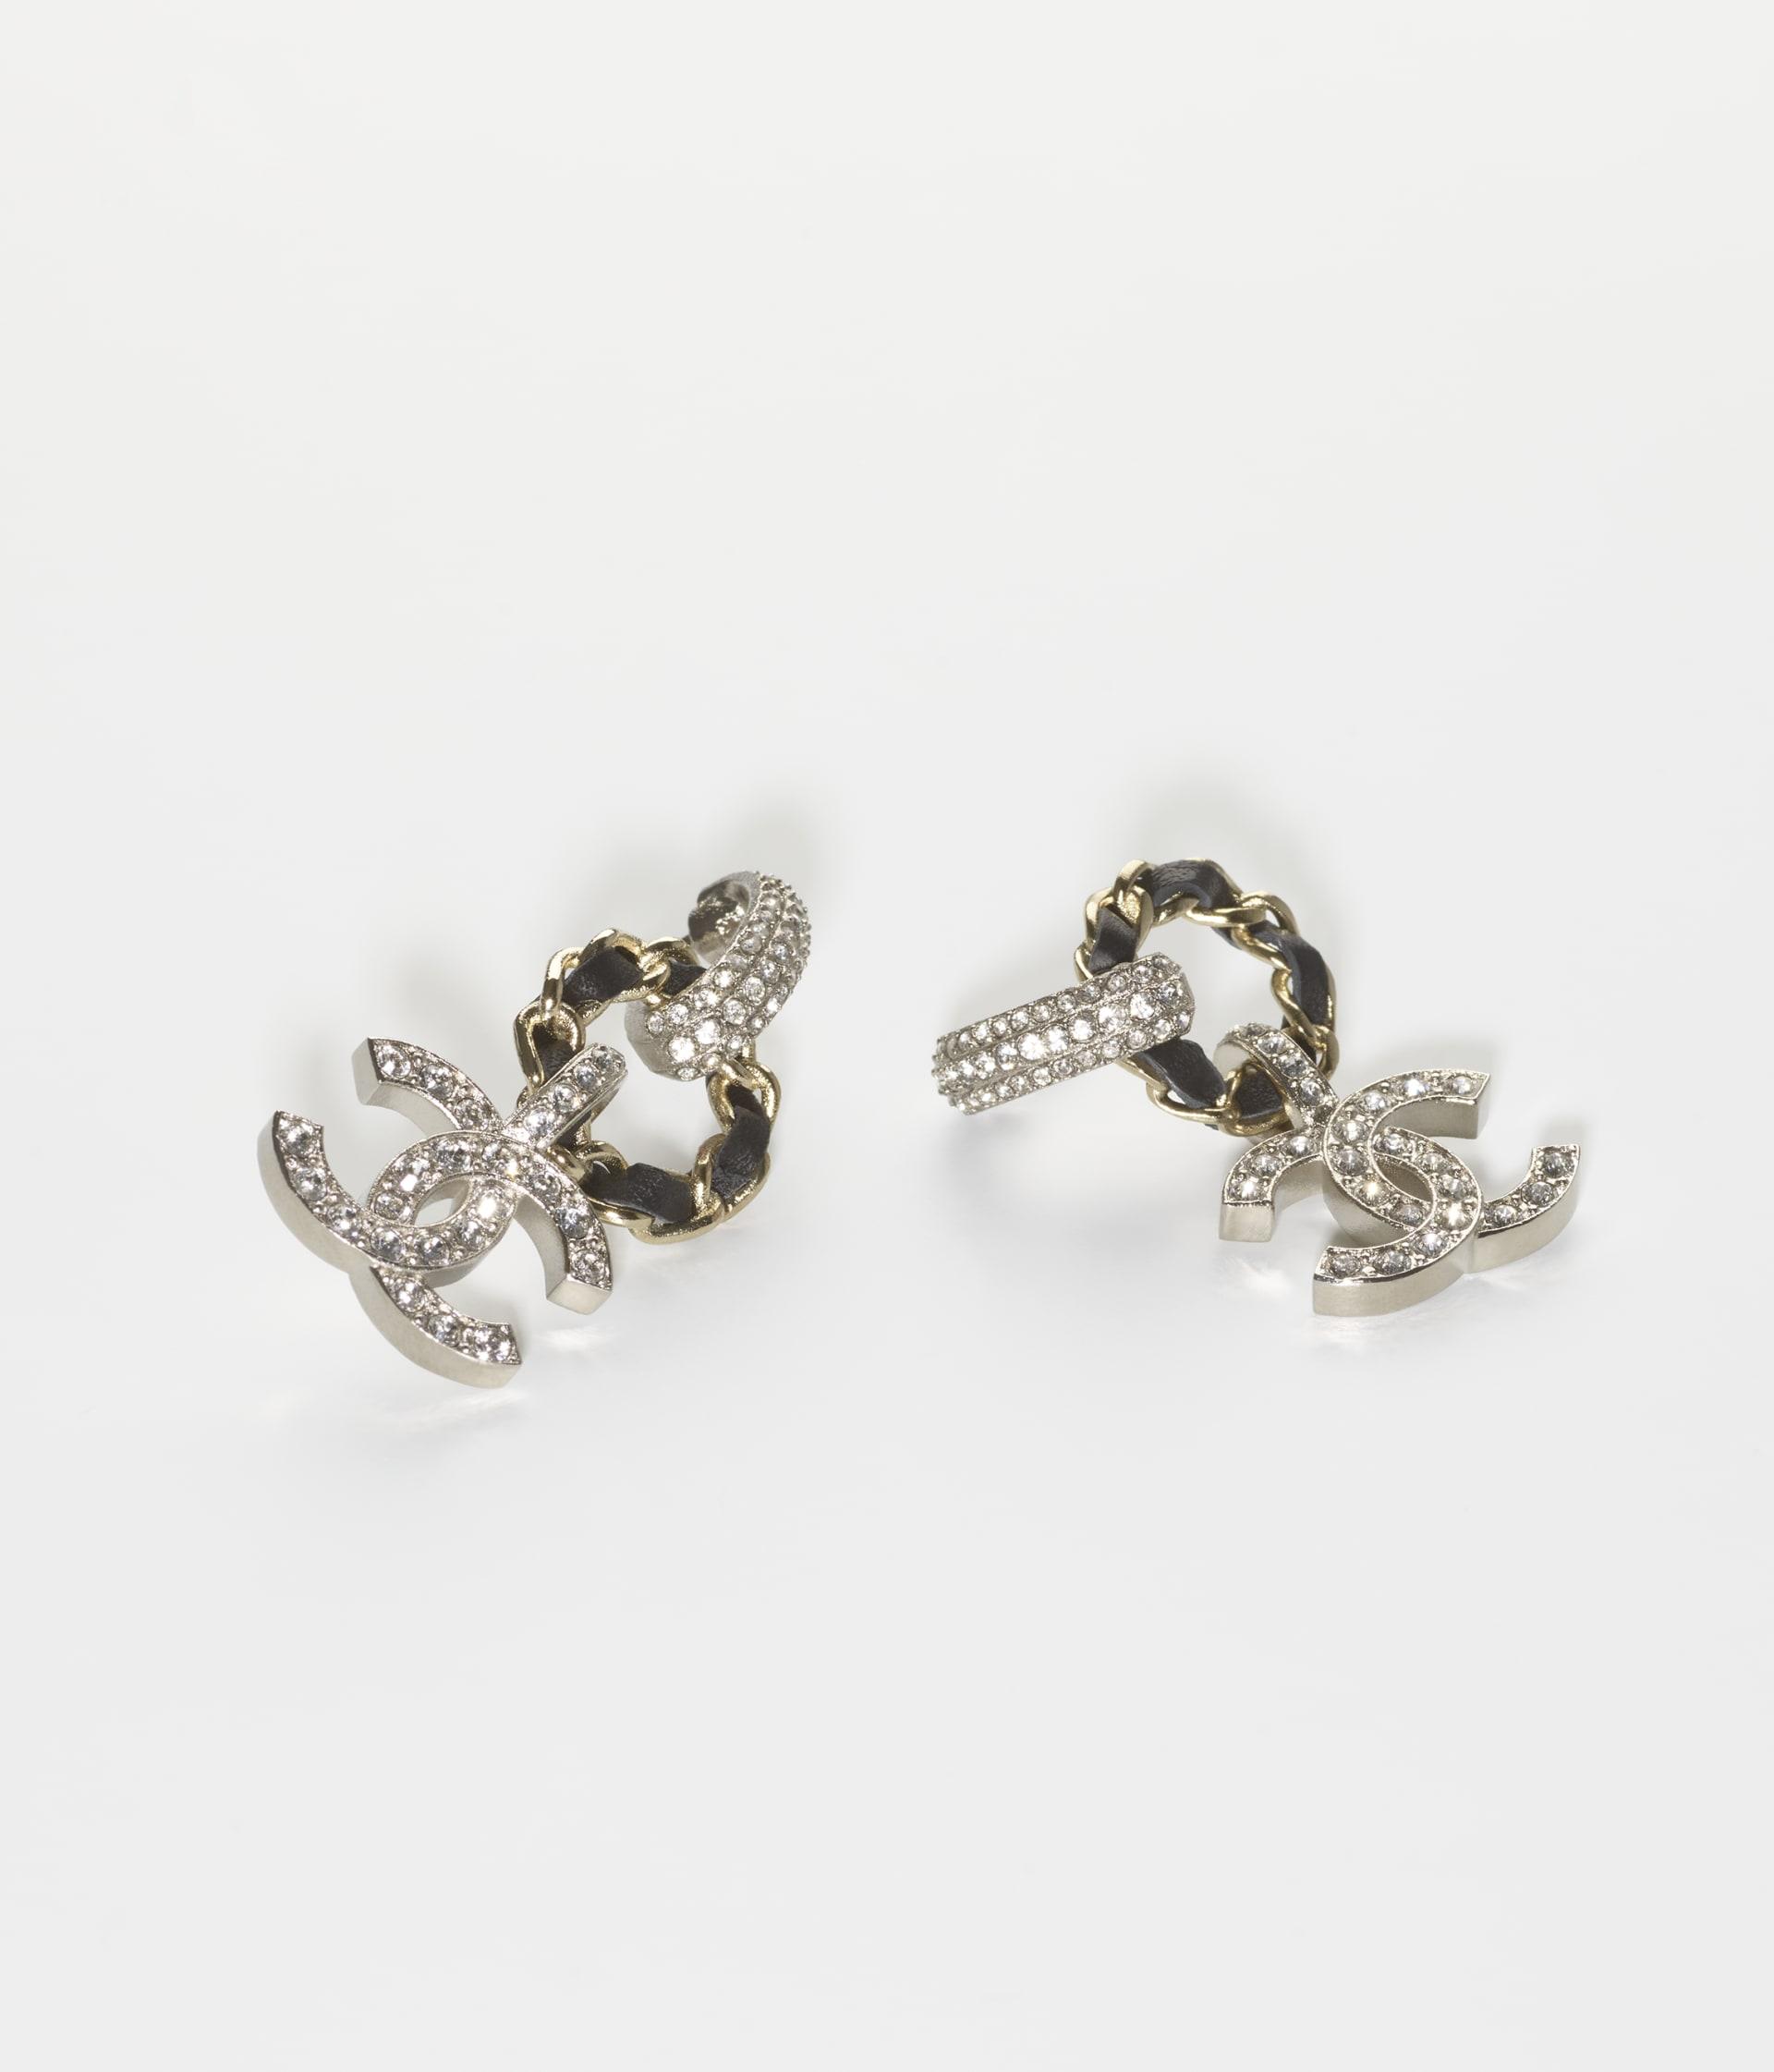 image 2 - Earrings - Metal, Calfskin & Strass - Gold, Silver, Black & Crystal